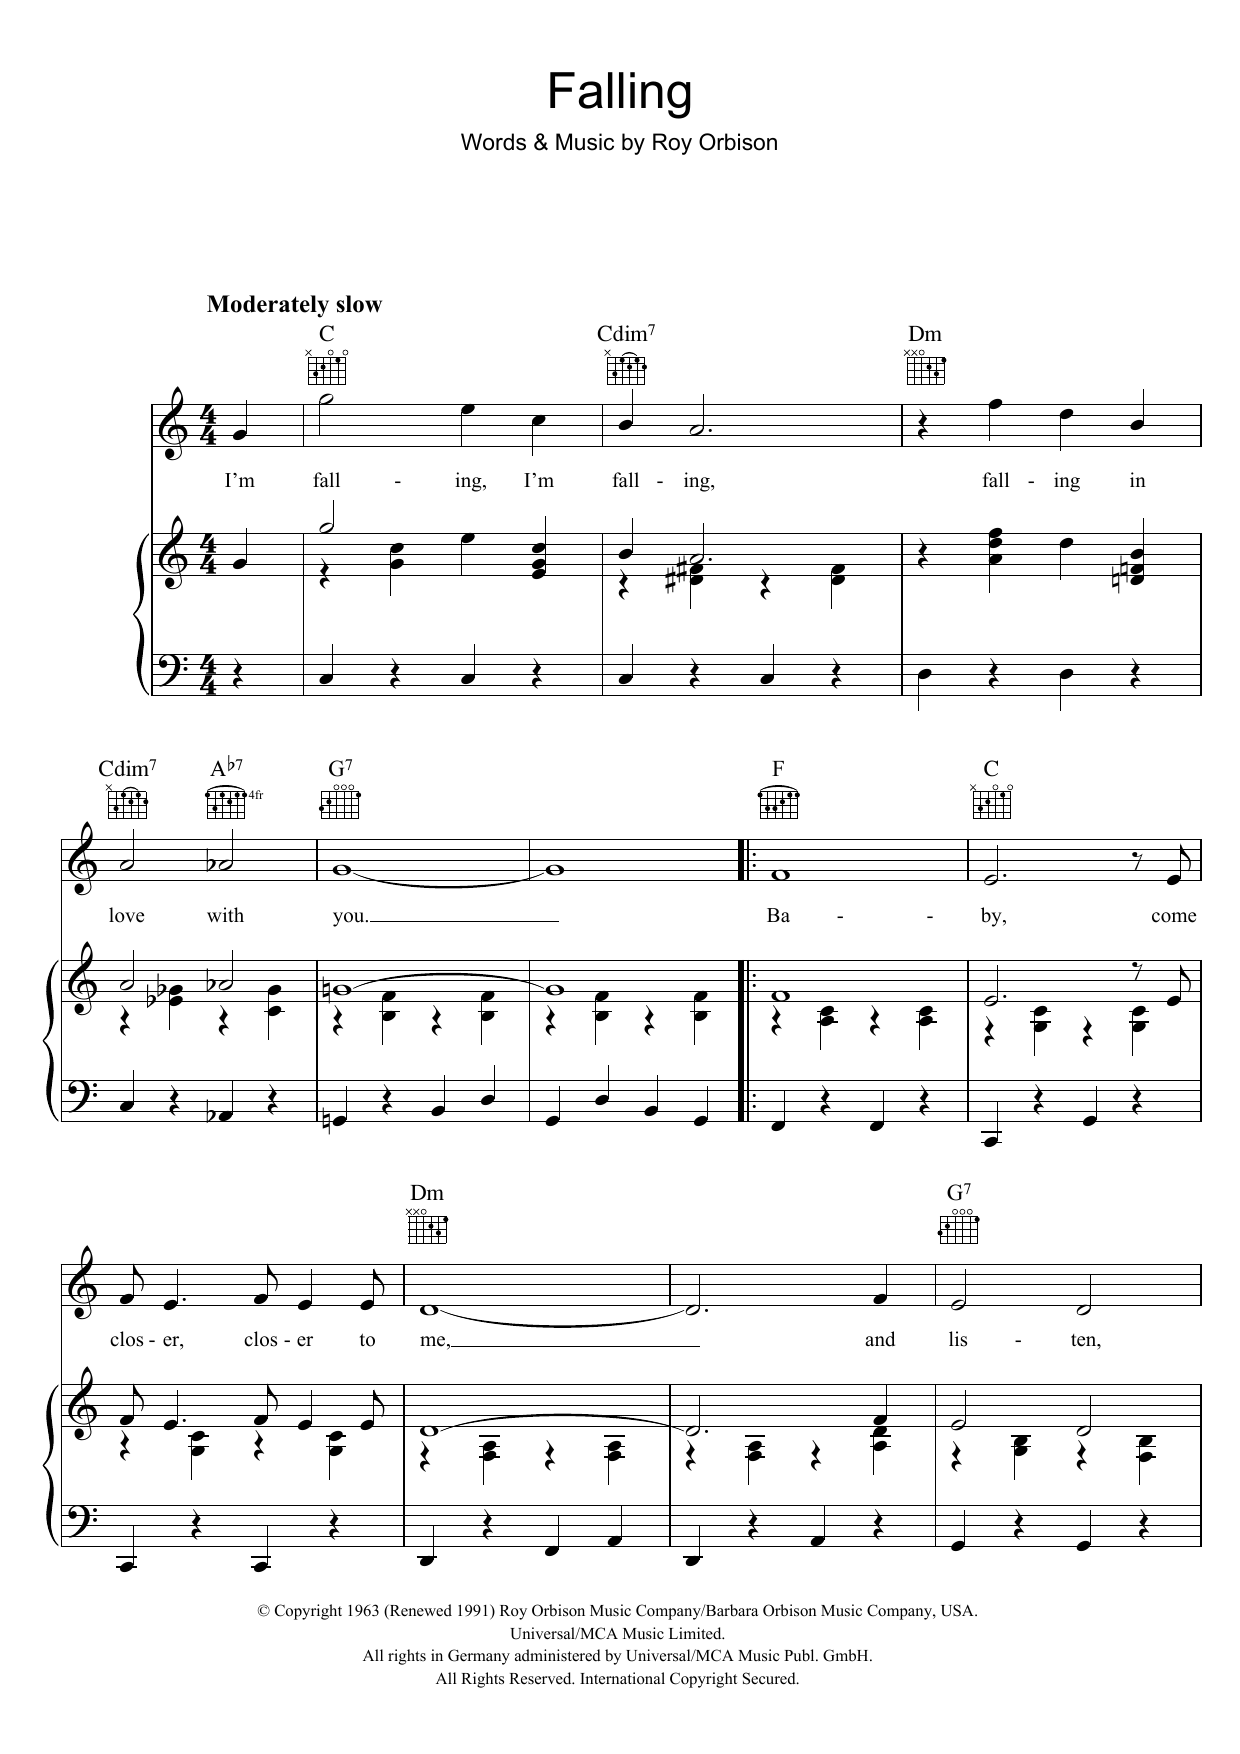 Roy Orbison - Falling